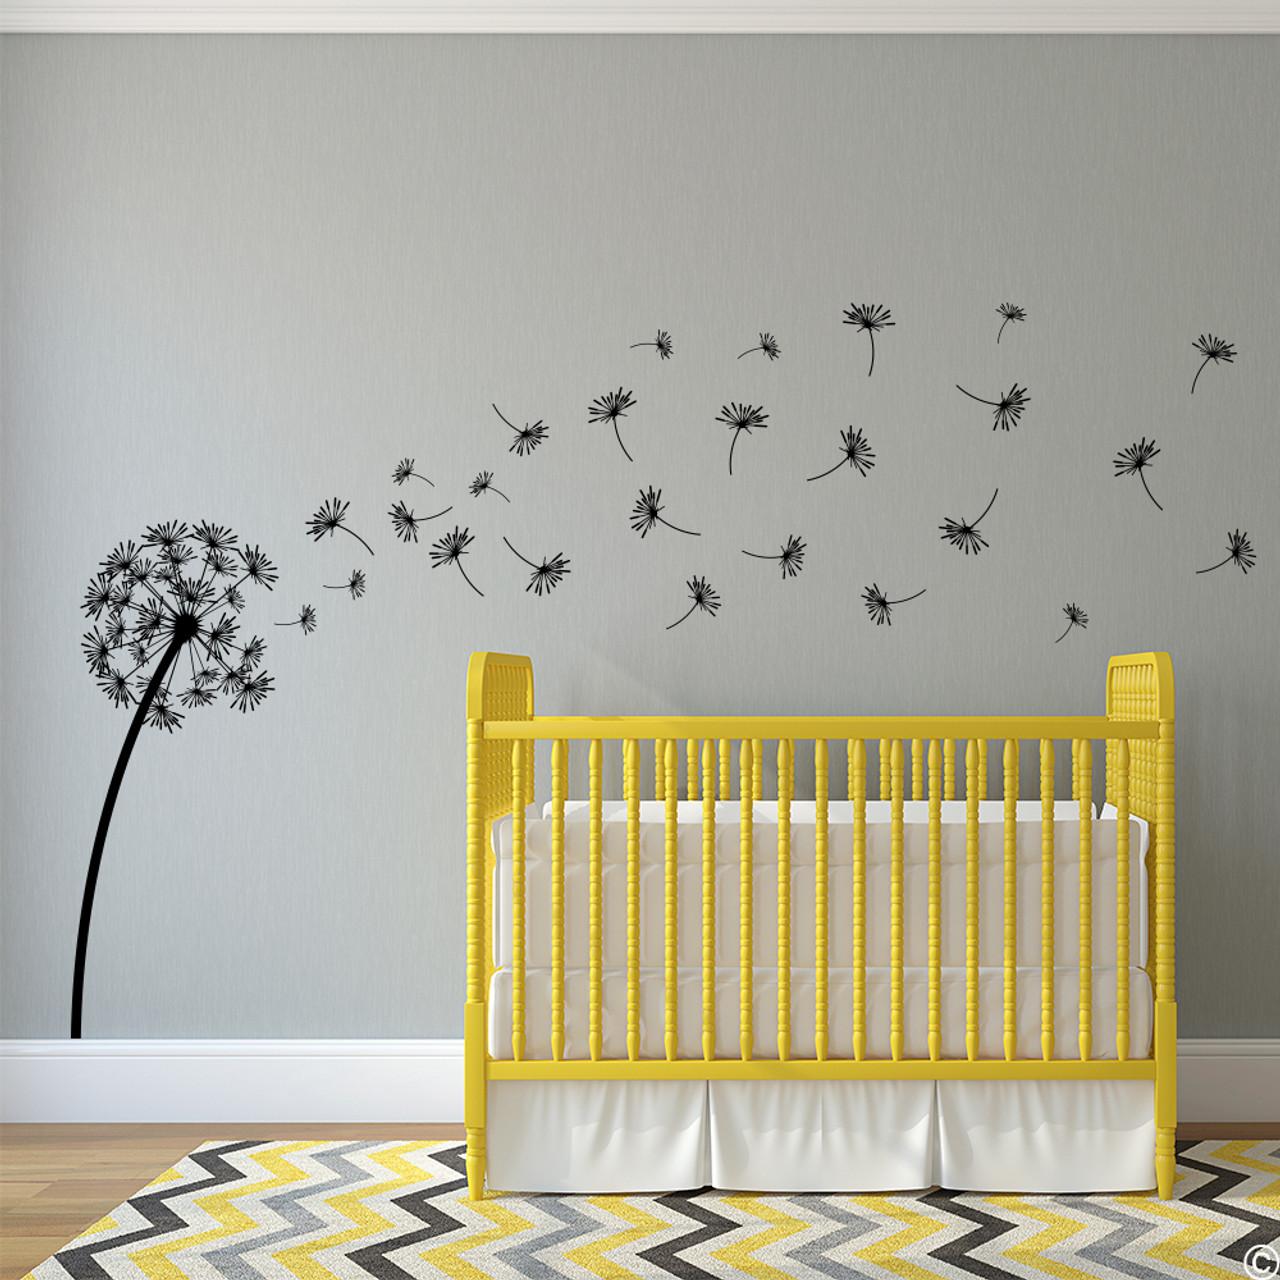 The Glinda dandelion vinyl wall decal in black